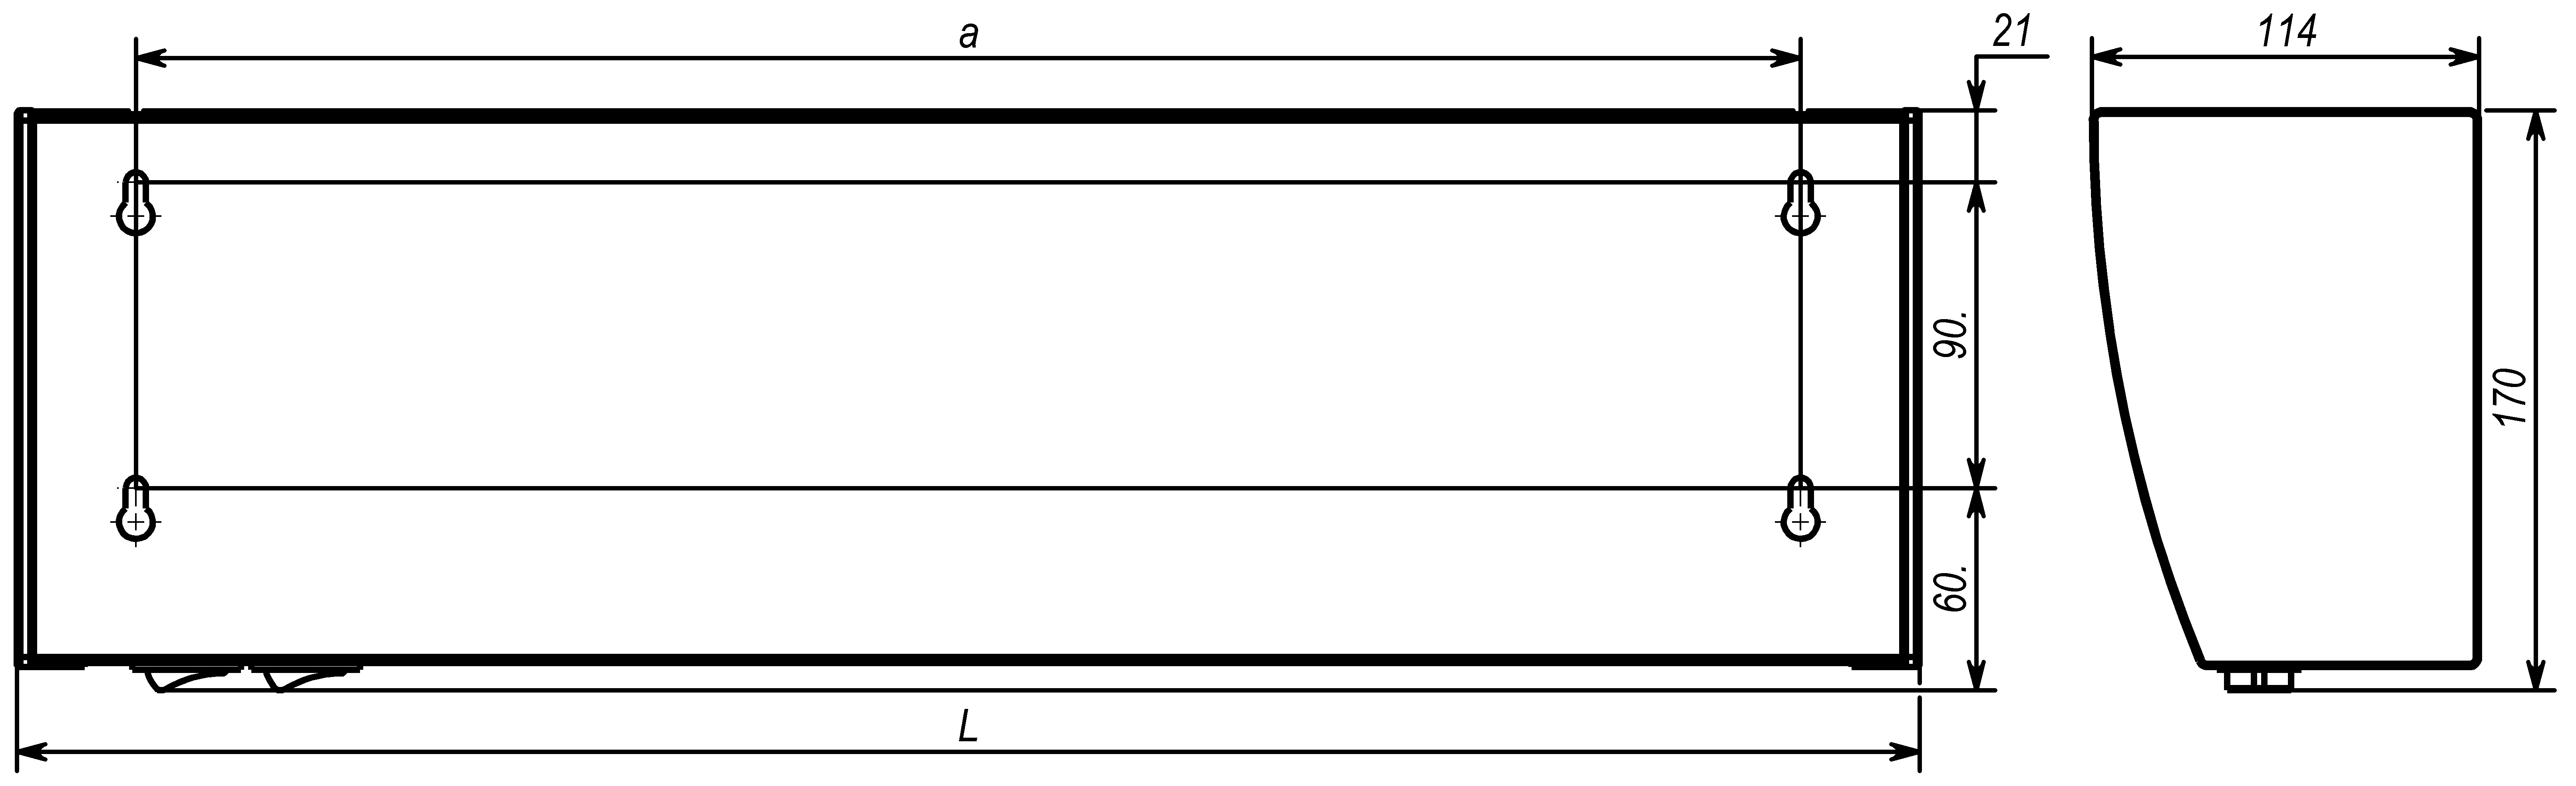 кабель кг 5х4-660